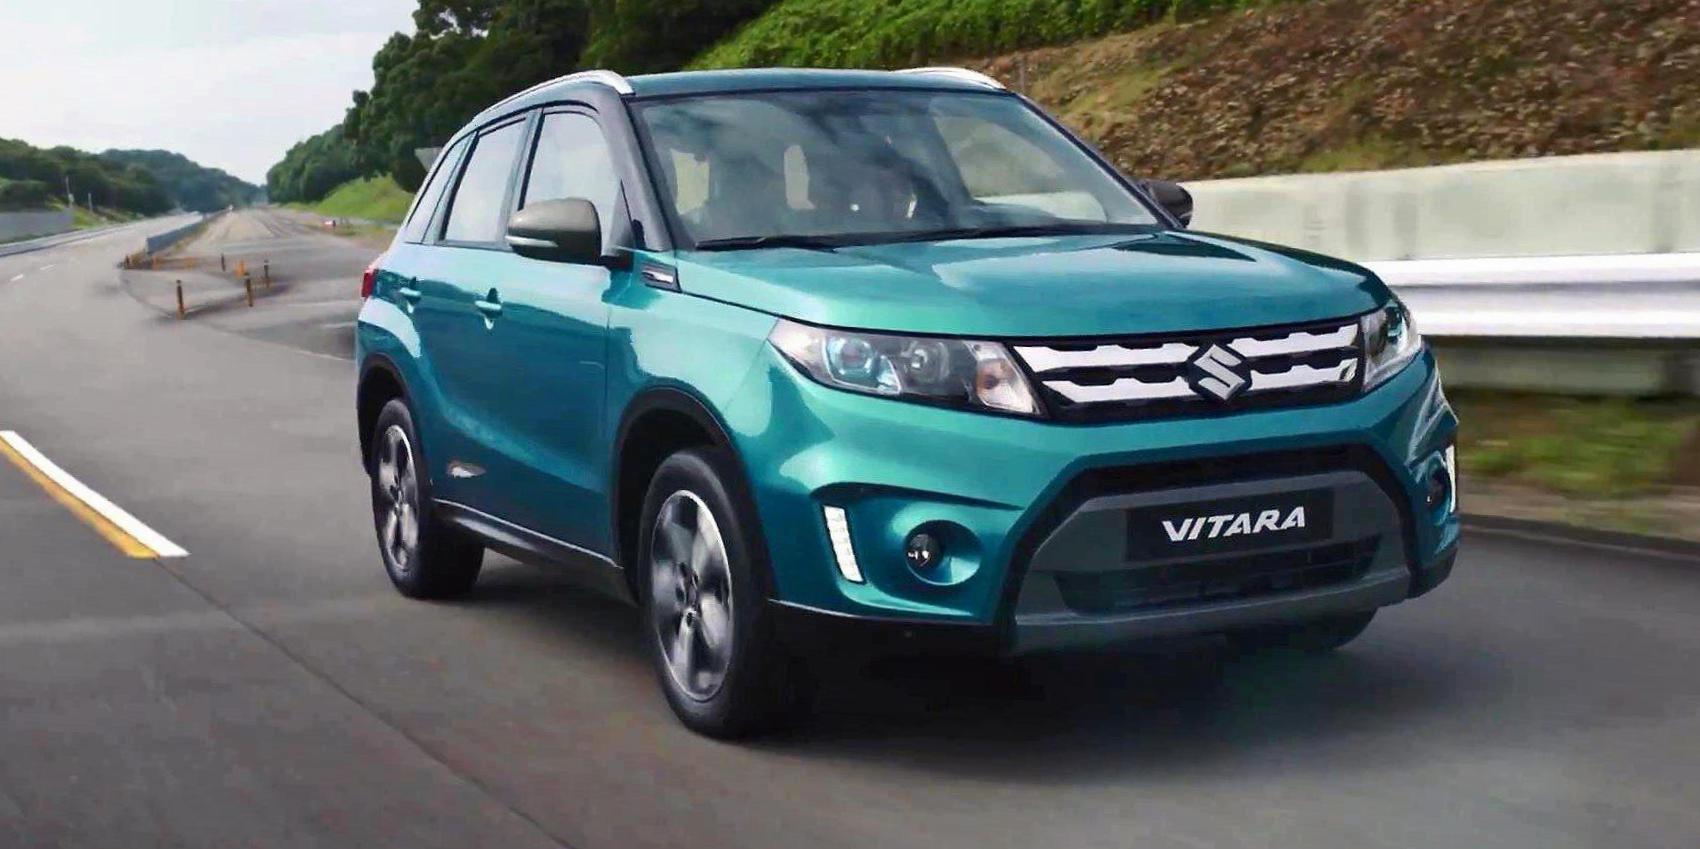 Suzuki Vitara Photos and Specs  Photo: Suzuki Vitara parts